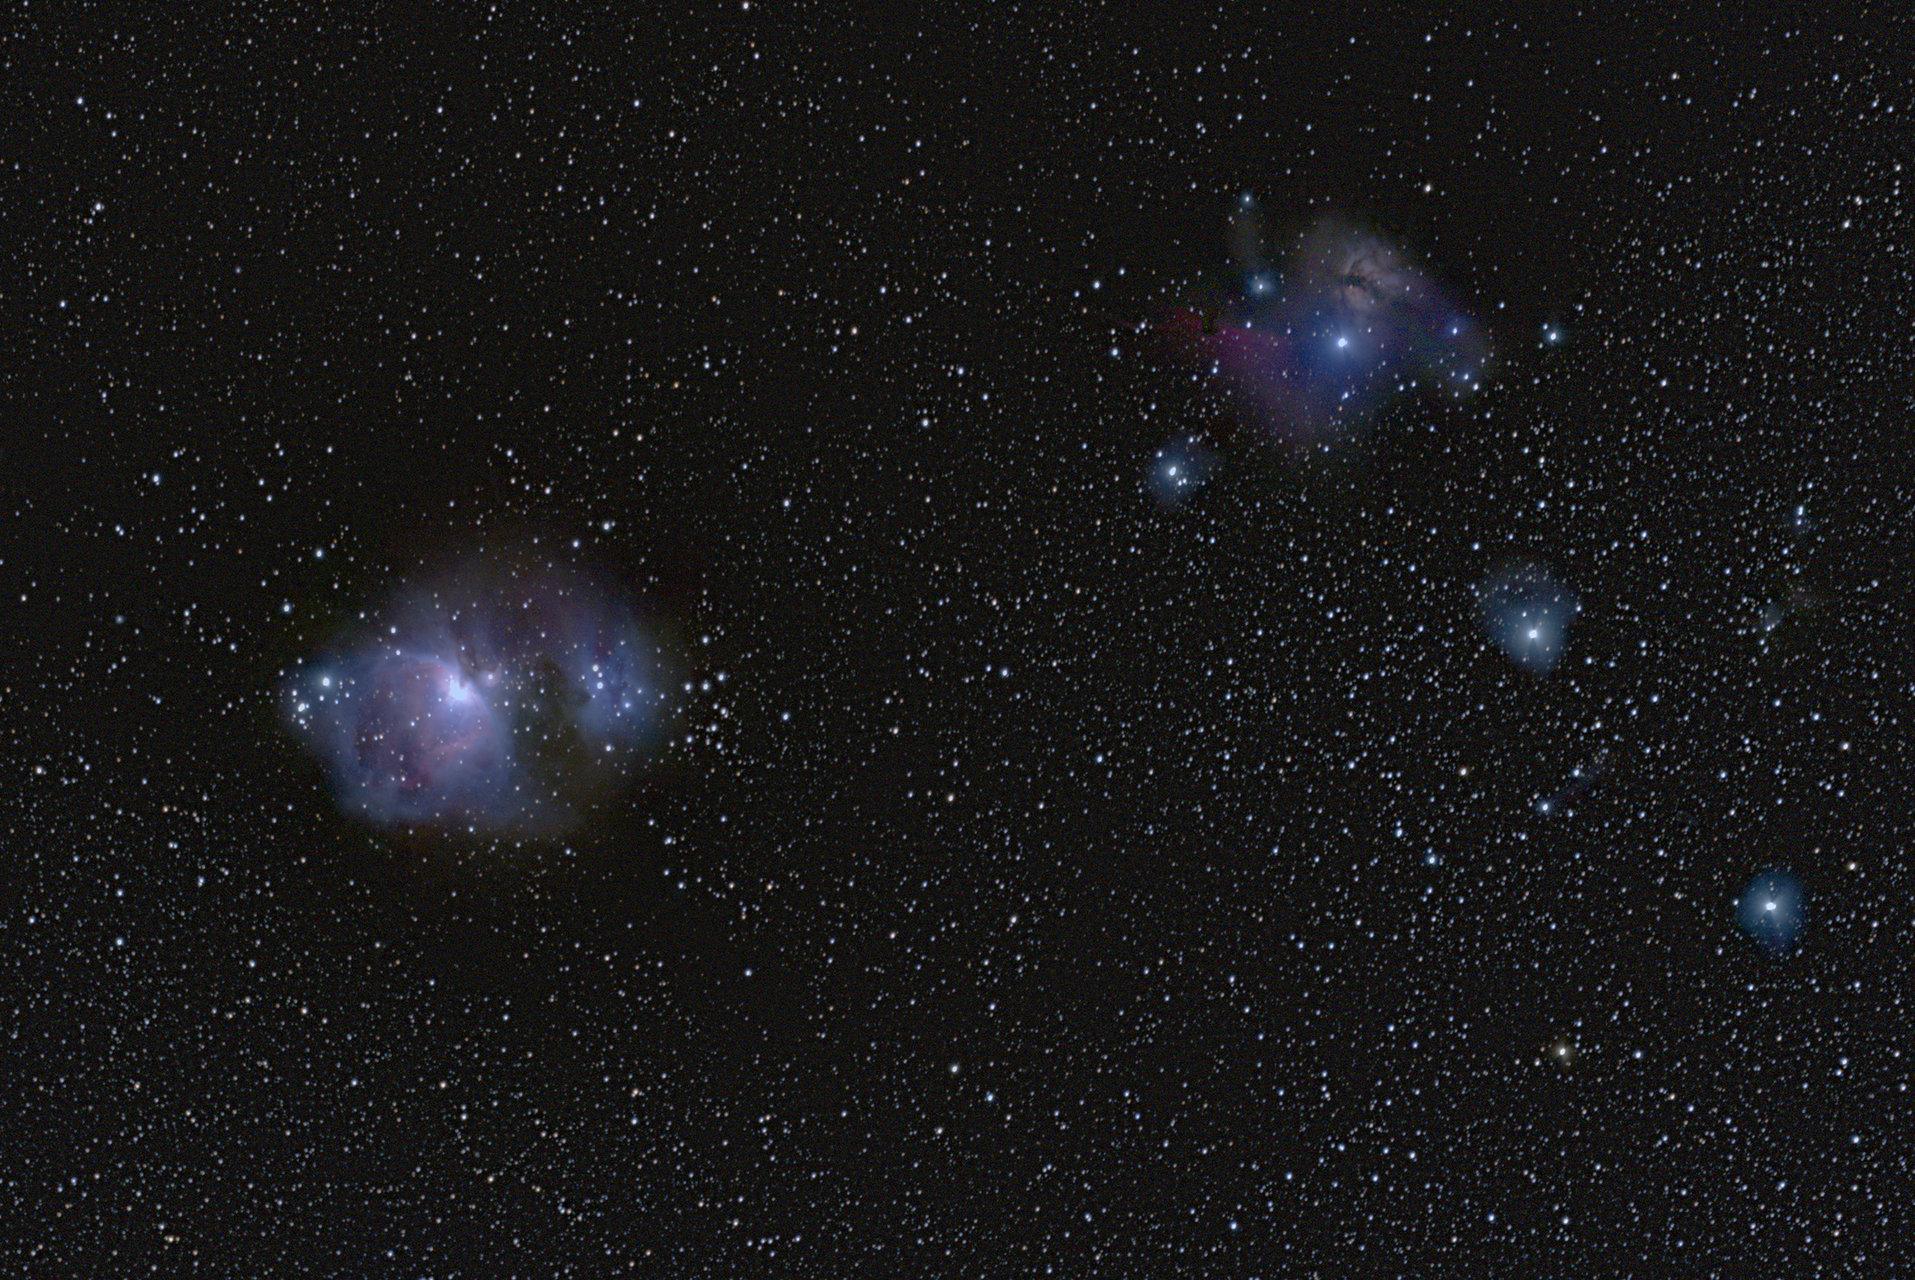 Мъглявината Орион (M42, NGC 1976) | Author Radoslav Sotirov - RBSotirov | PHOTO FORUM